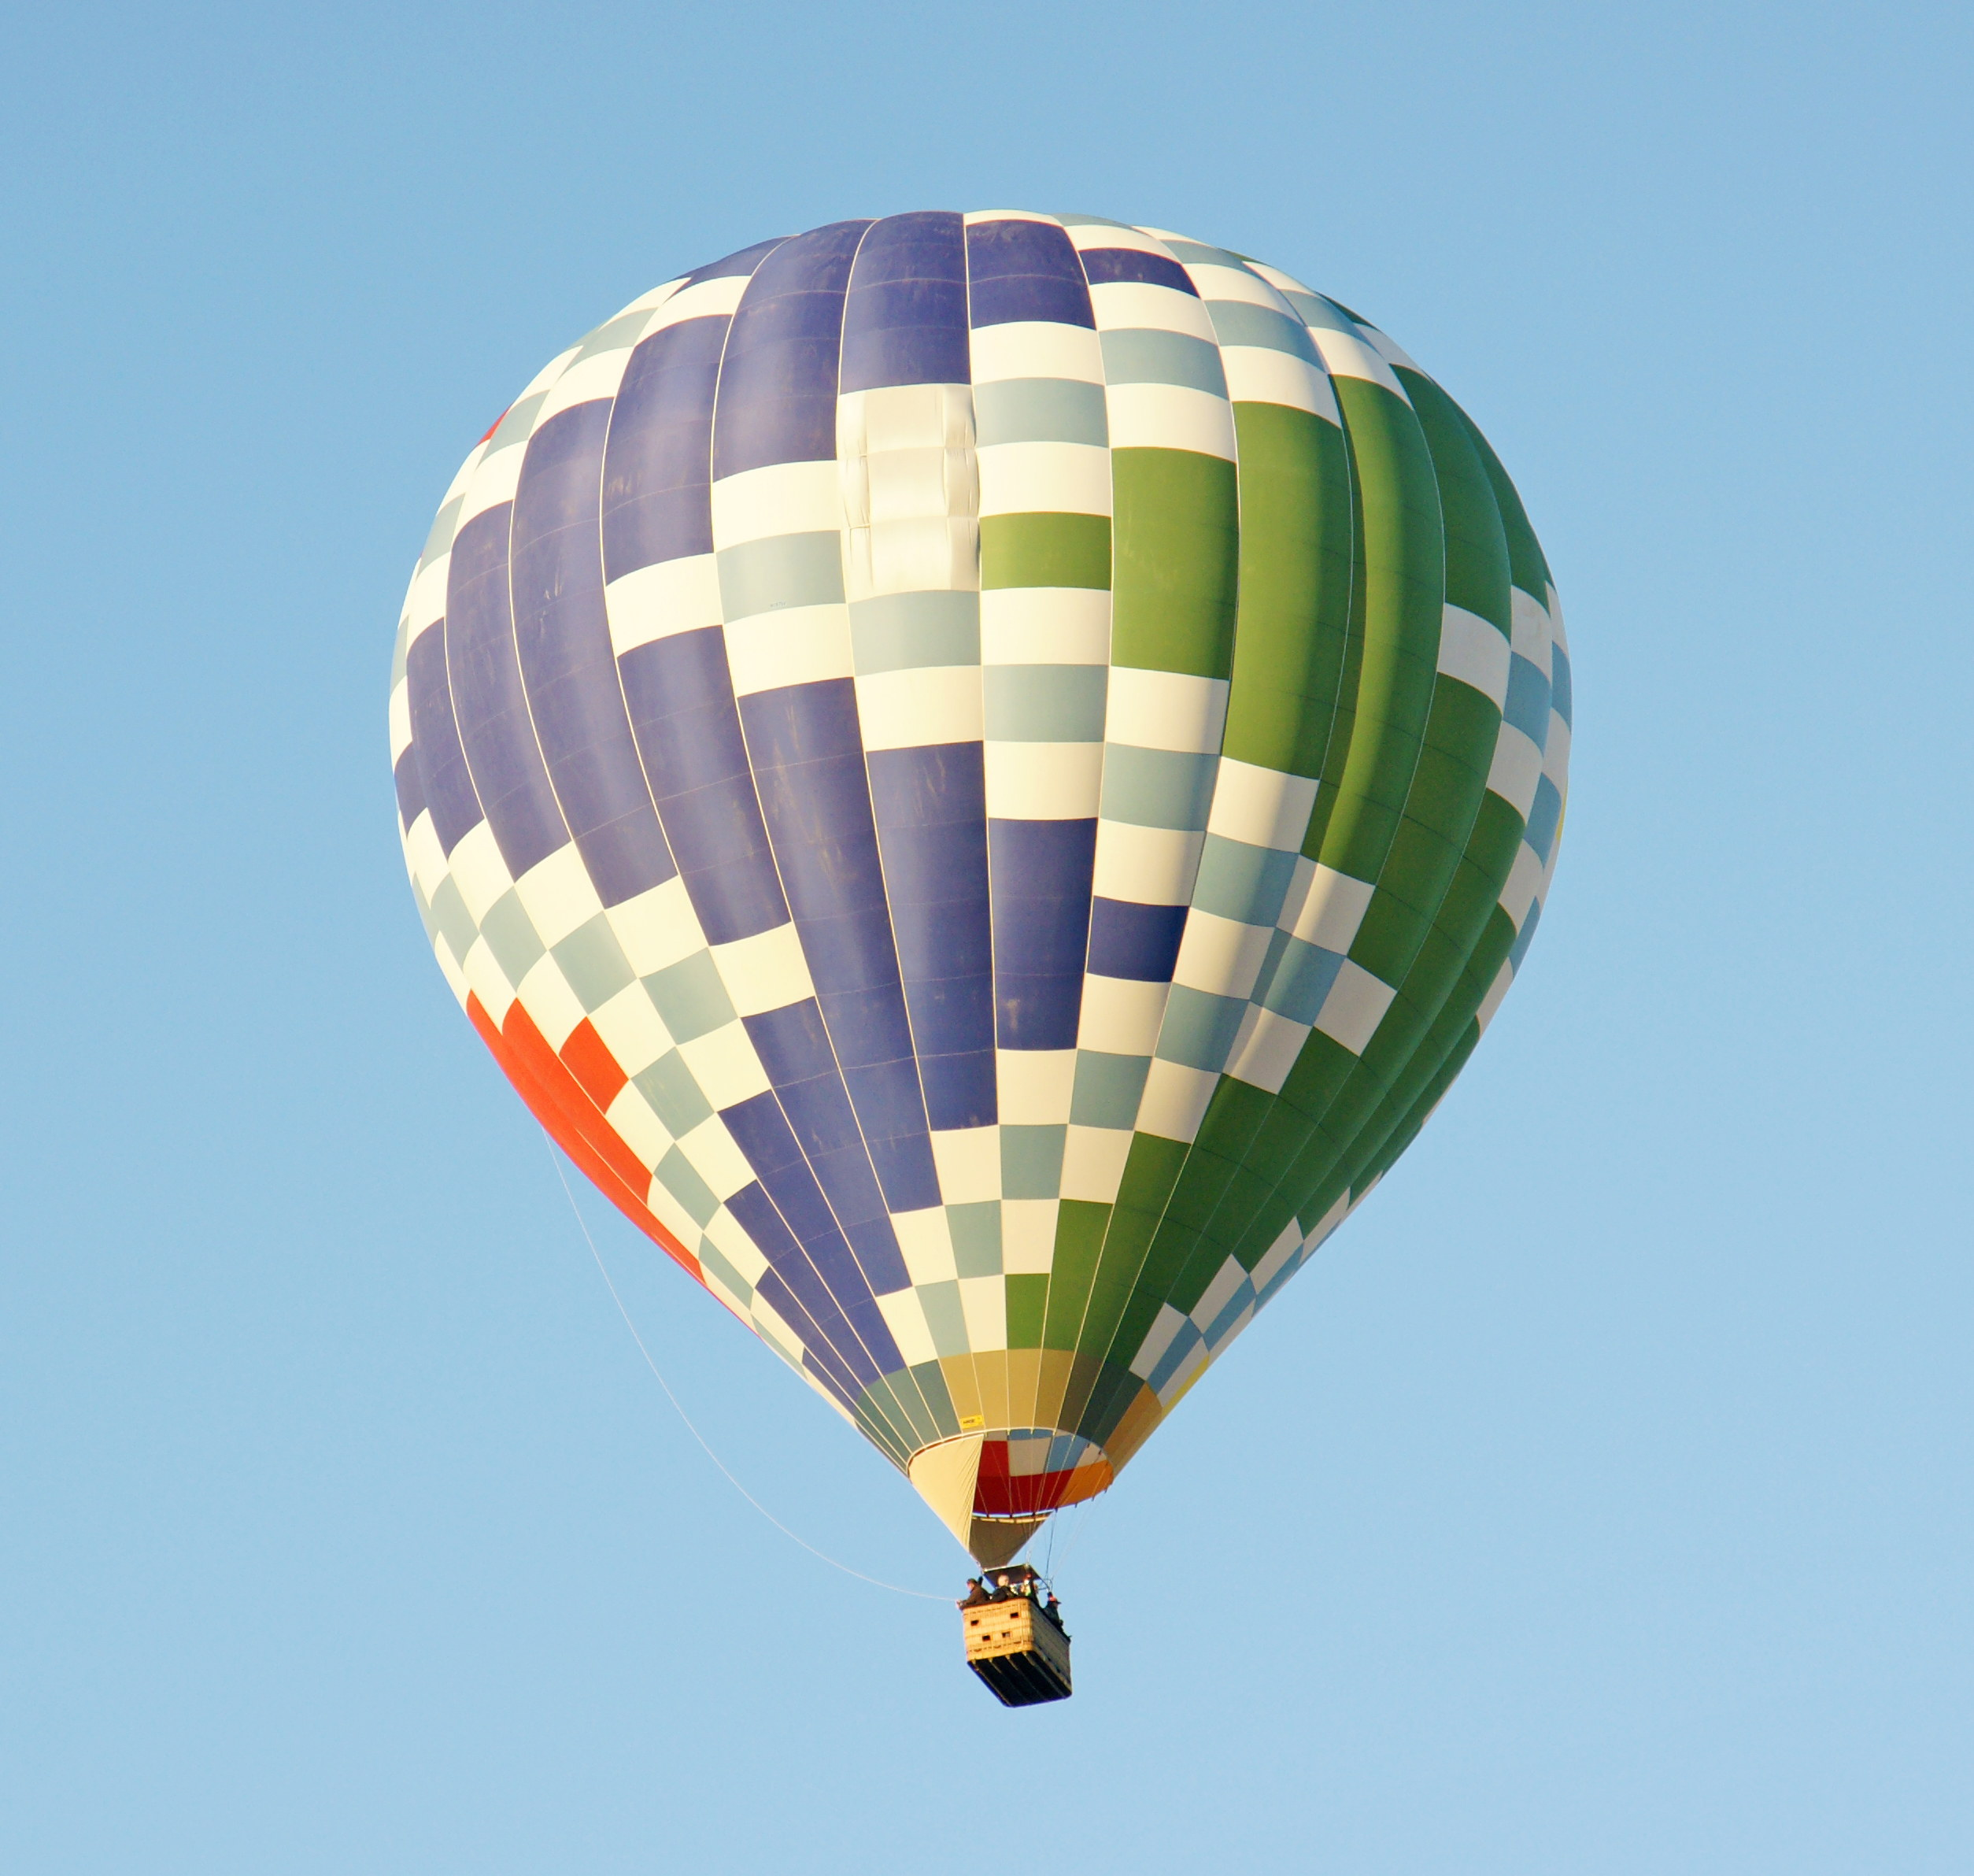 aibf-Single-Balloons-Gallery06